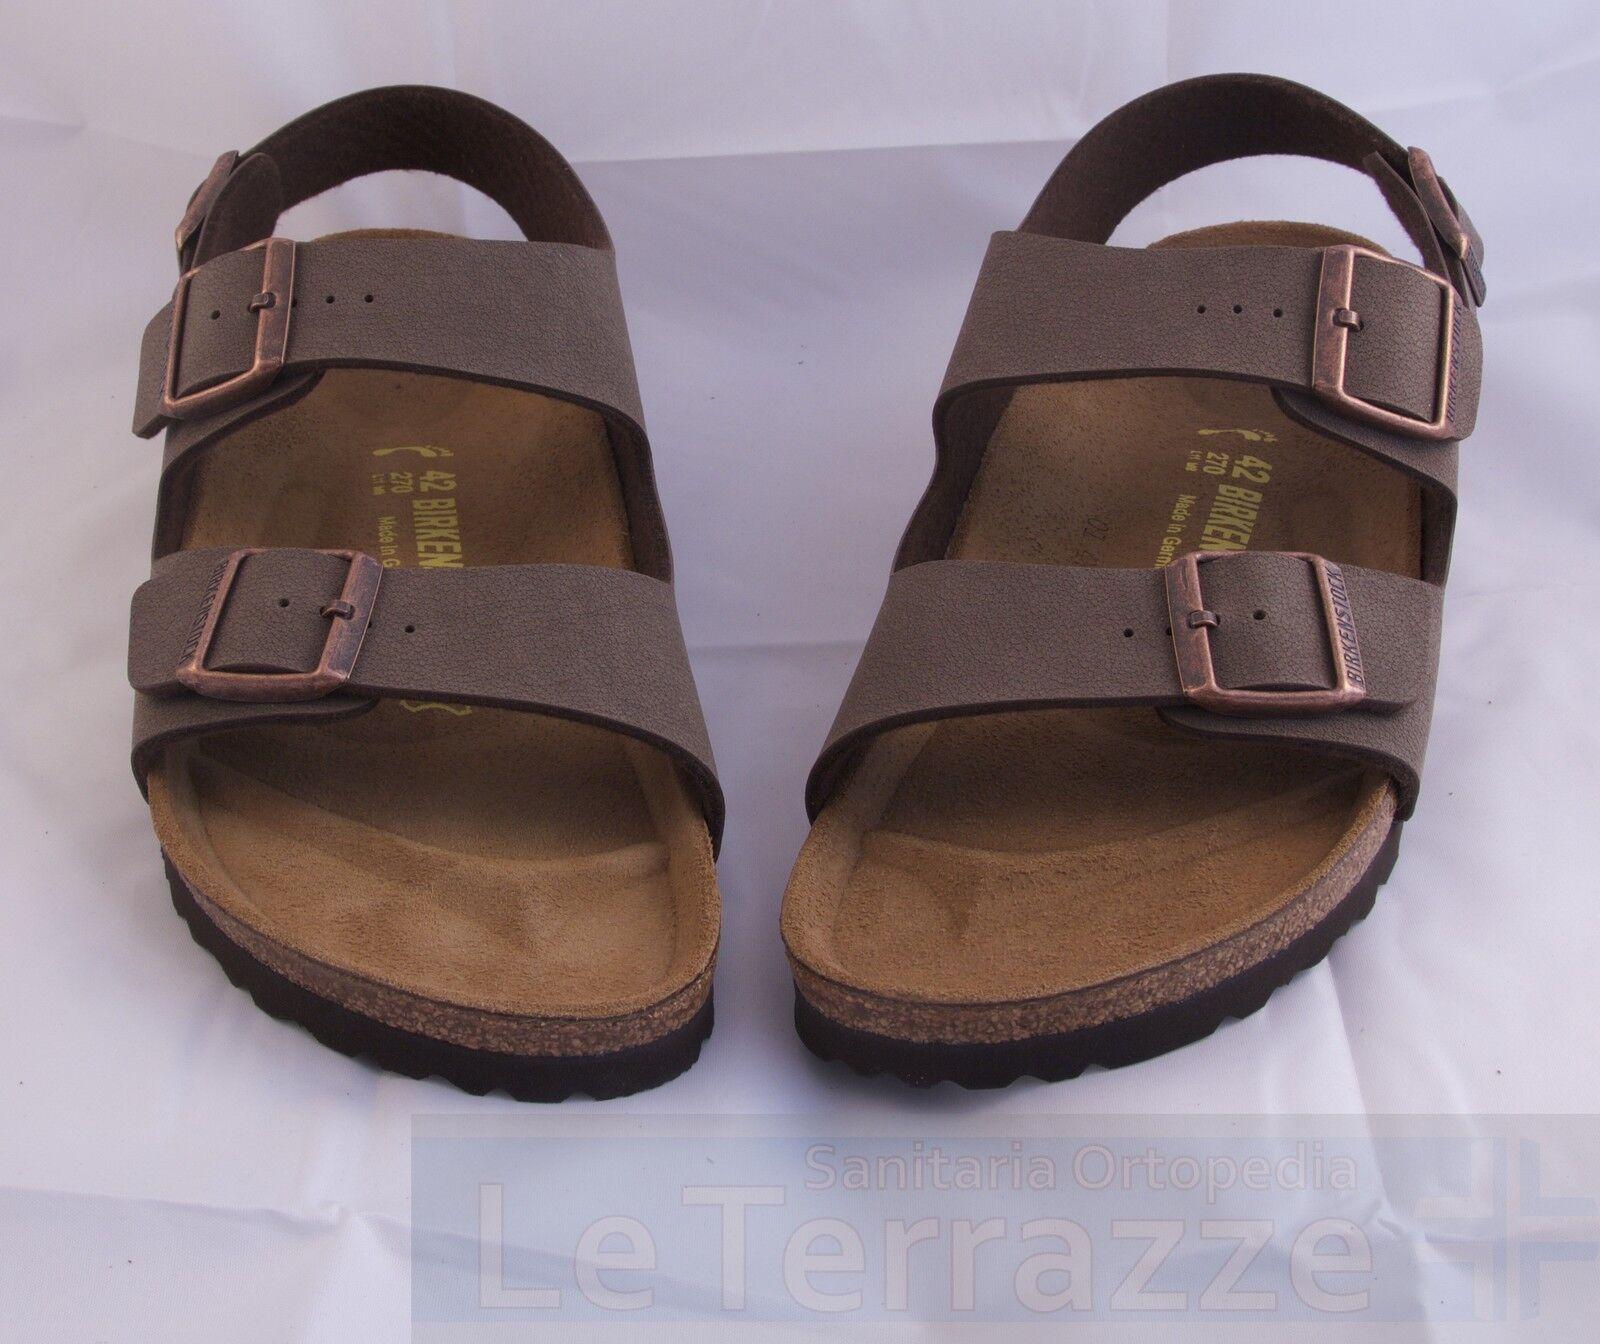 Birkenstock Milano Hausschuhe sandalen sandalen sandalen gurt 160af2